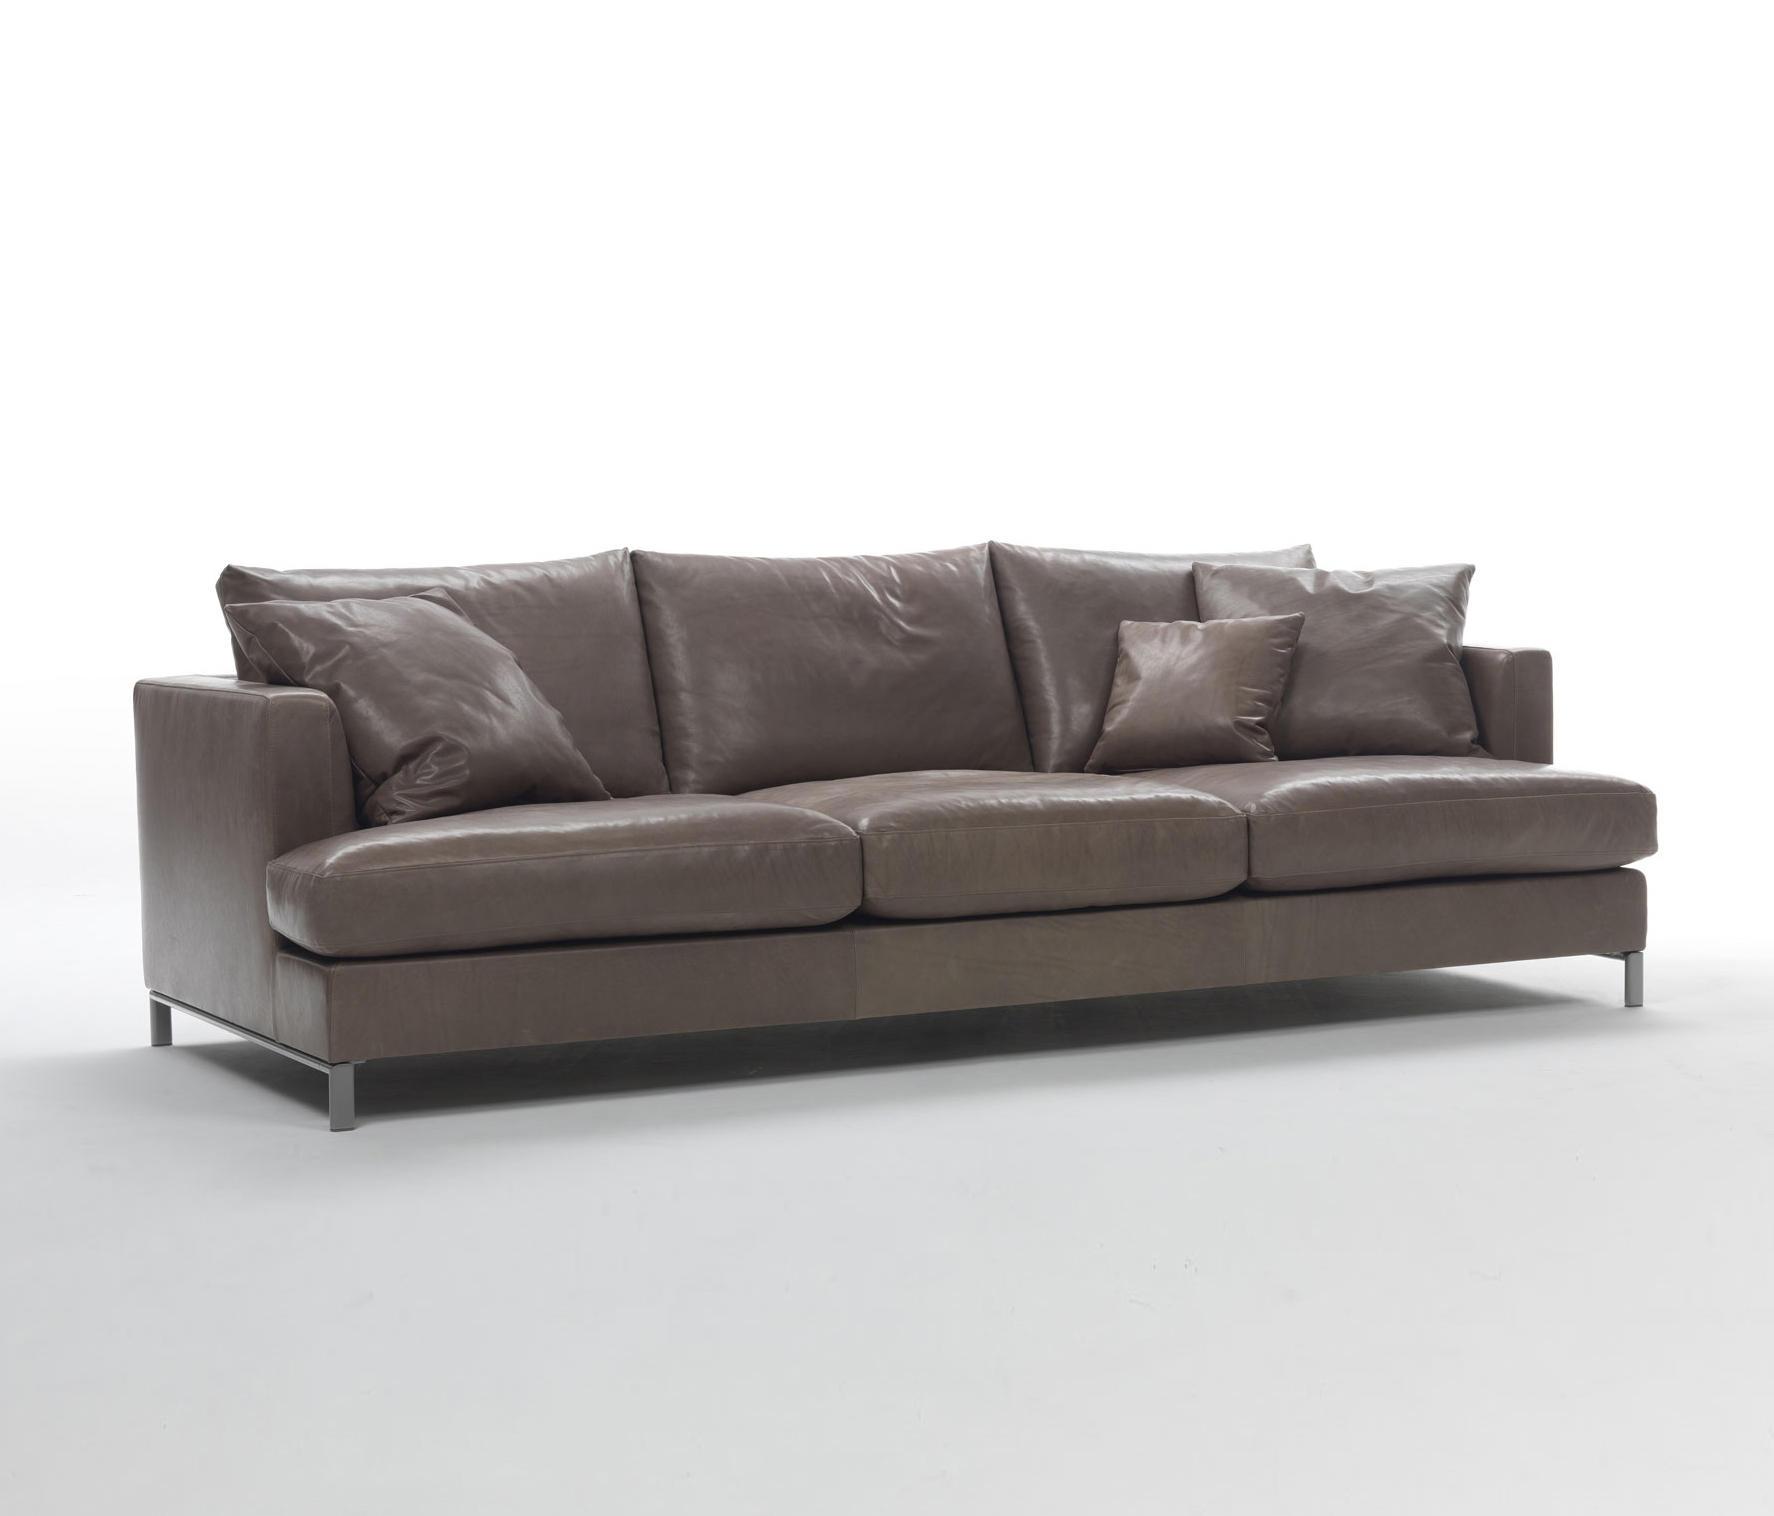 Loft Sofa By Marelli Sofas